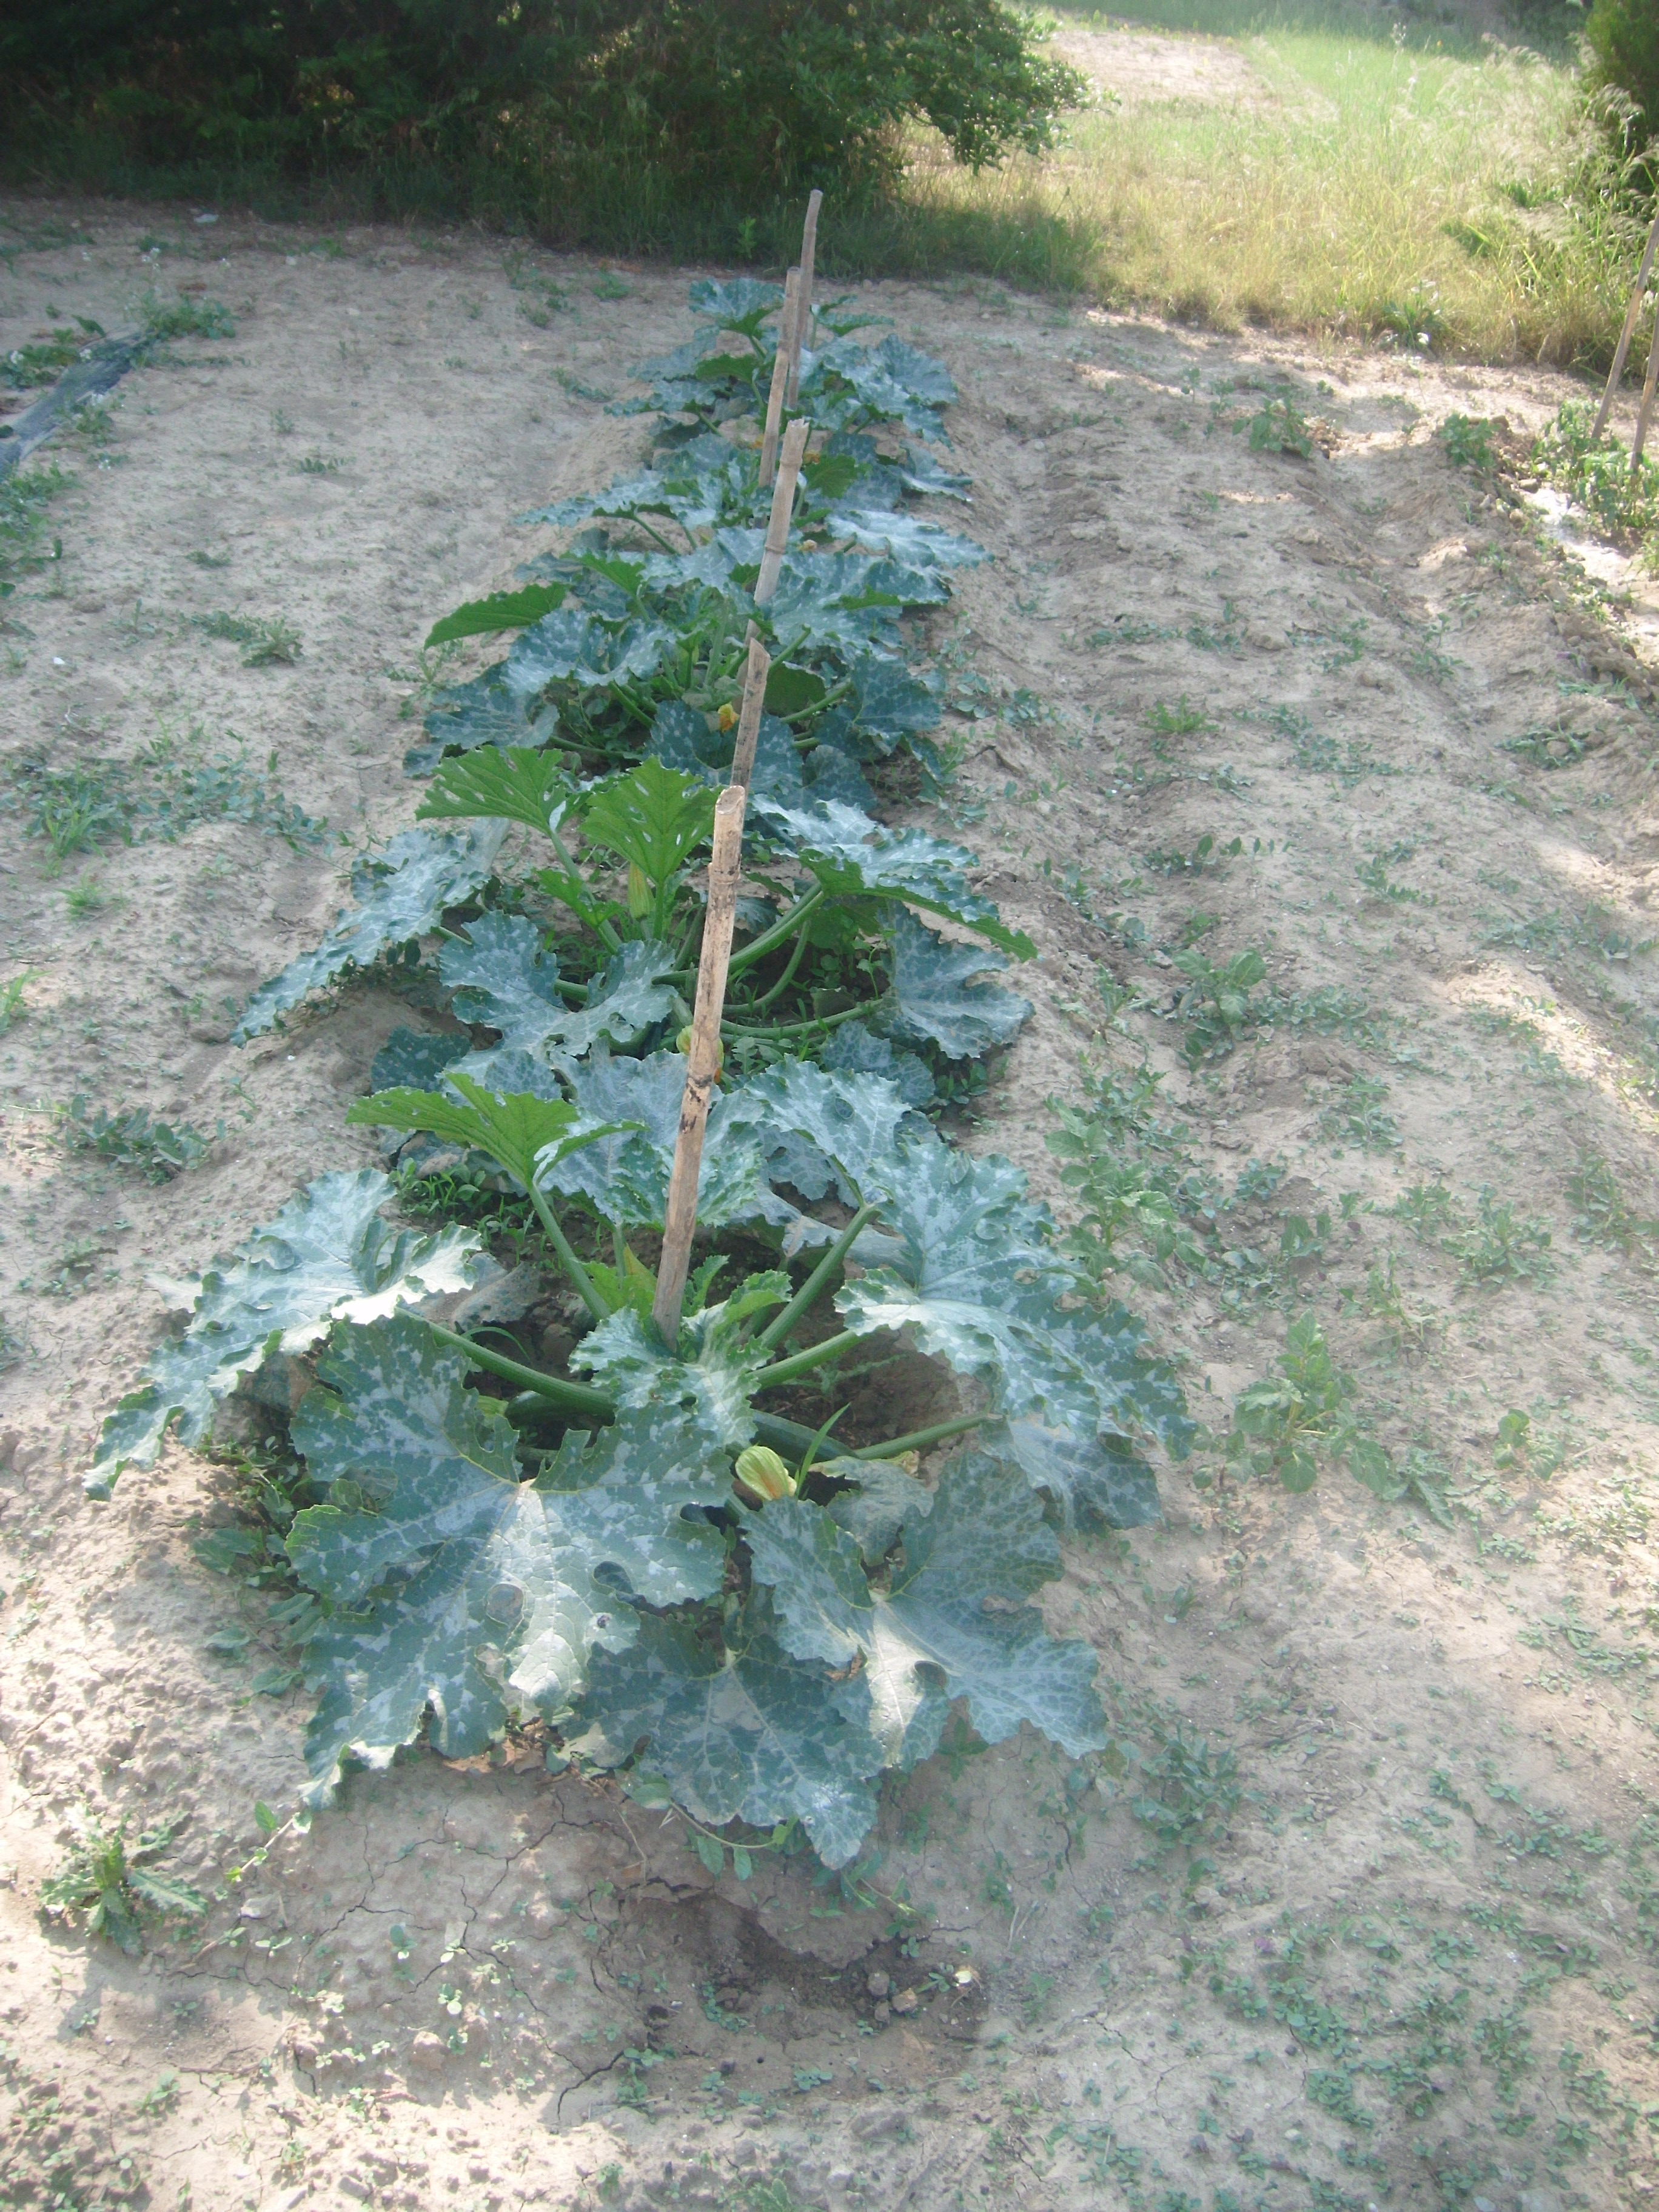 Jardin potager 3 - Congeler les haricots verts du jardin ...